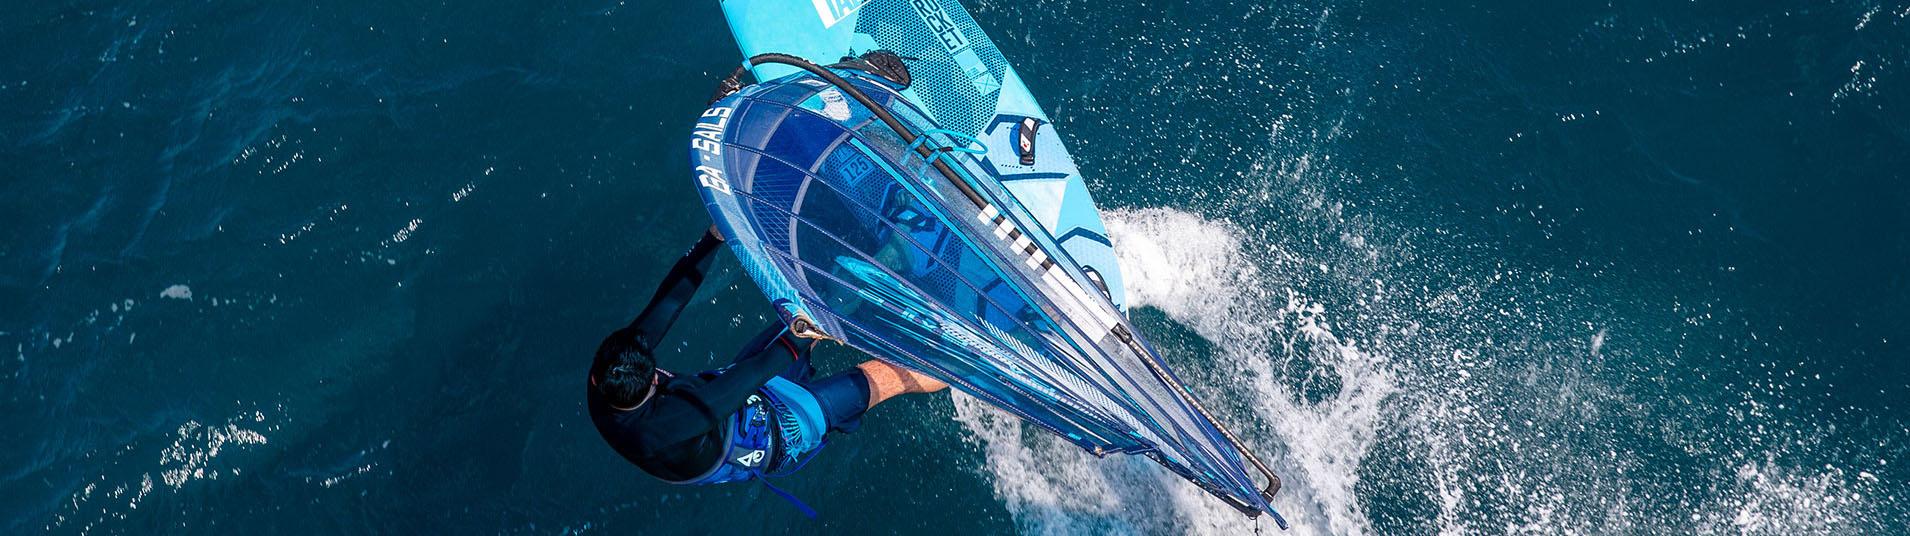 Windsurfen - de ultime uitleg